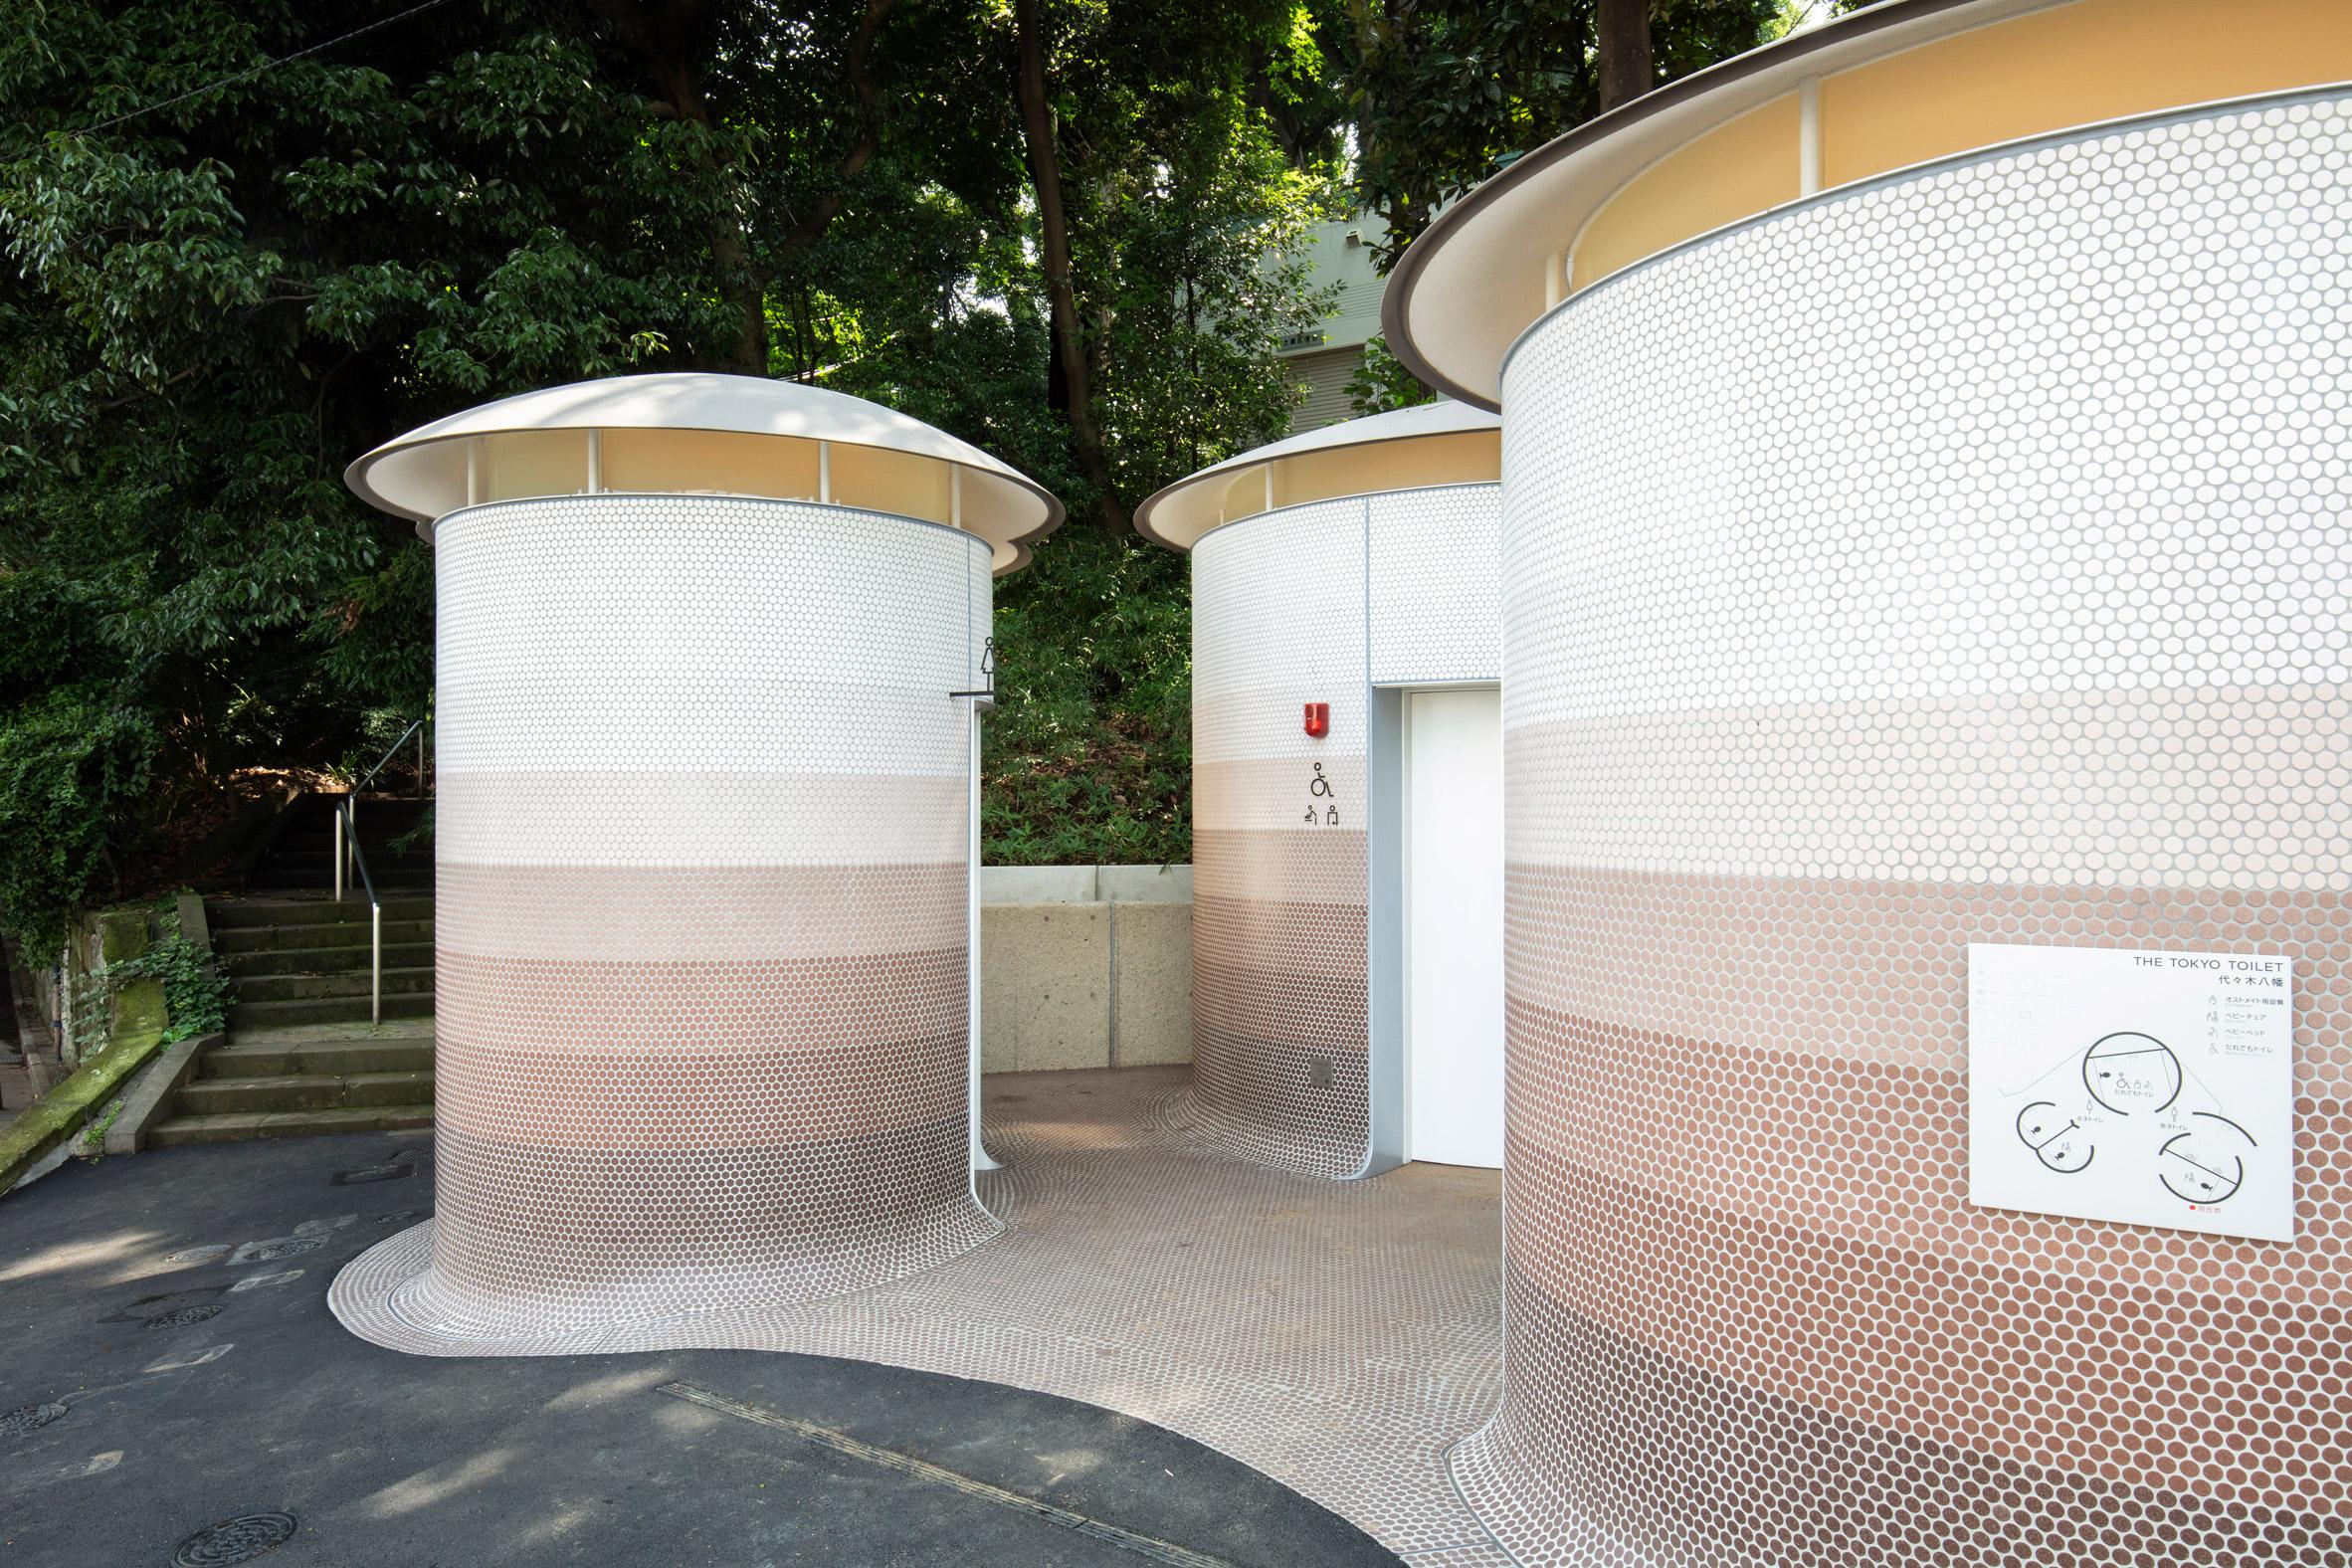 Toyo Ito toilet in Tokyo